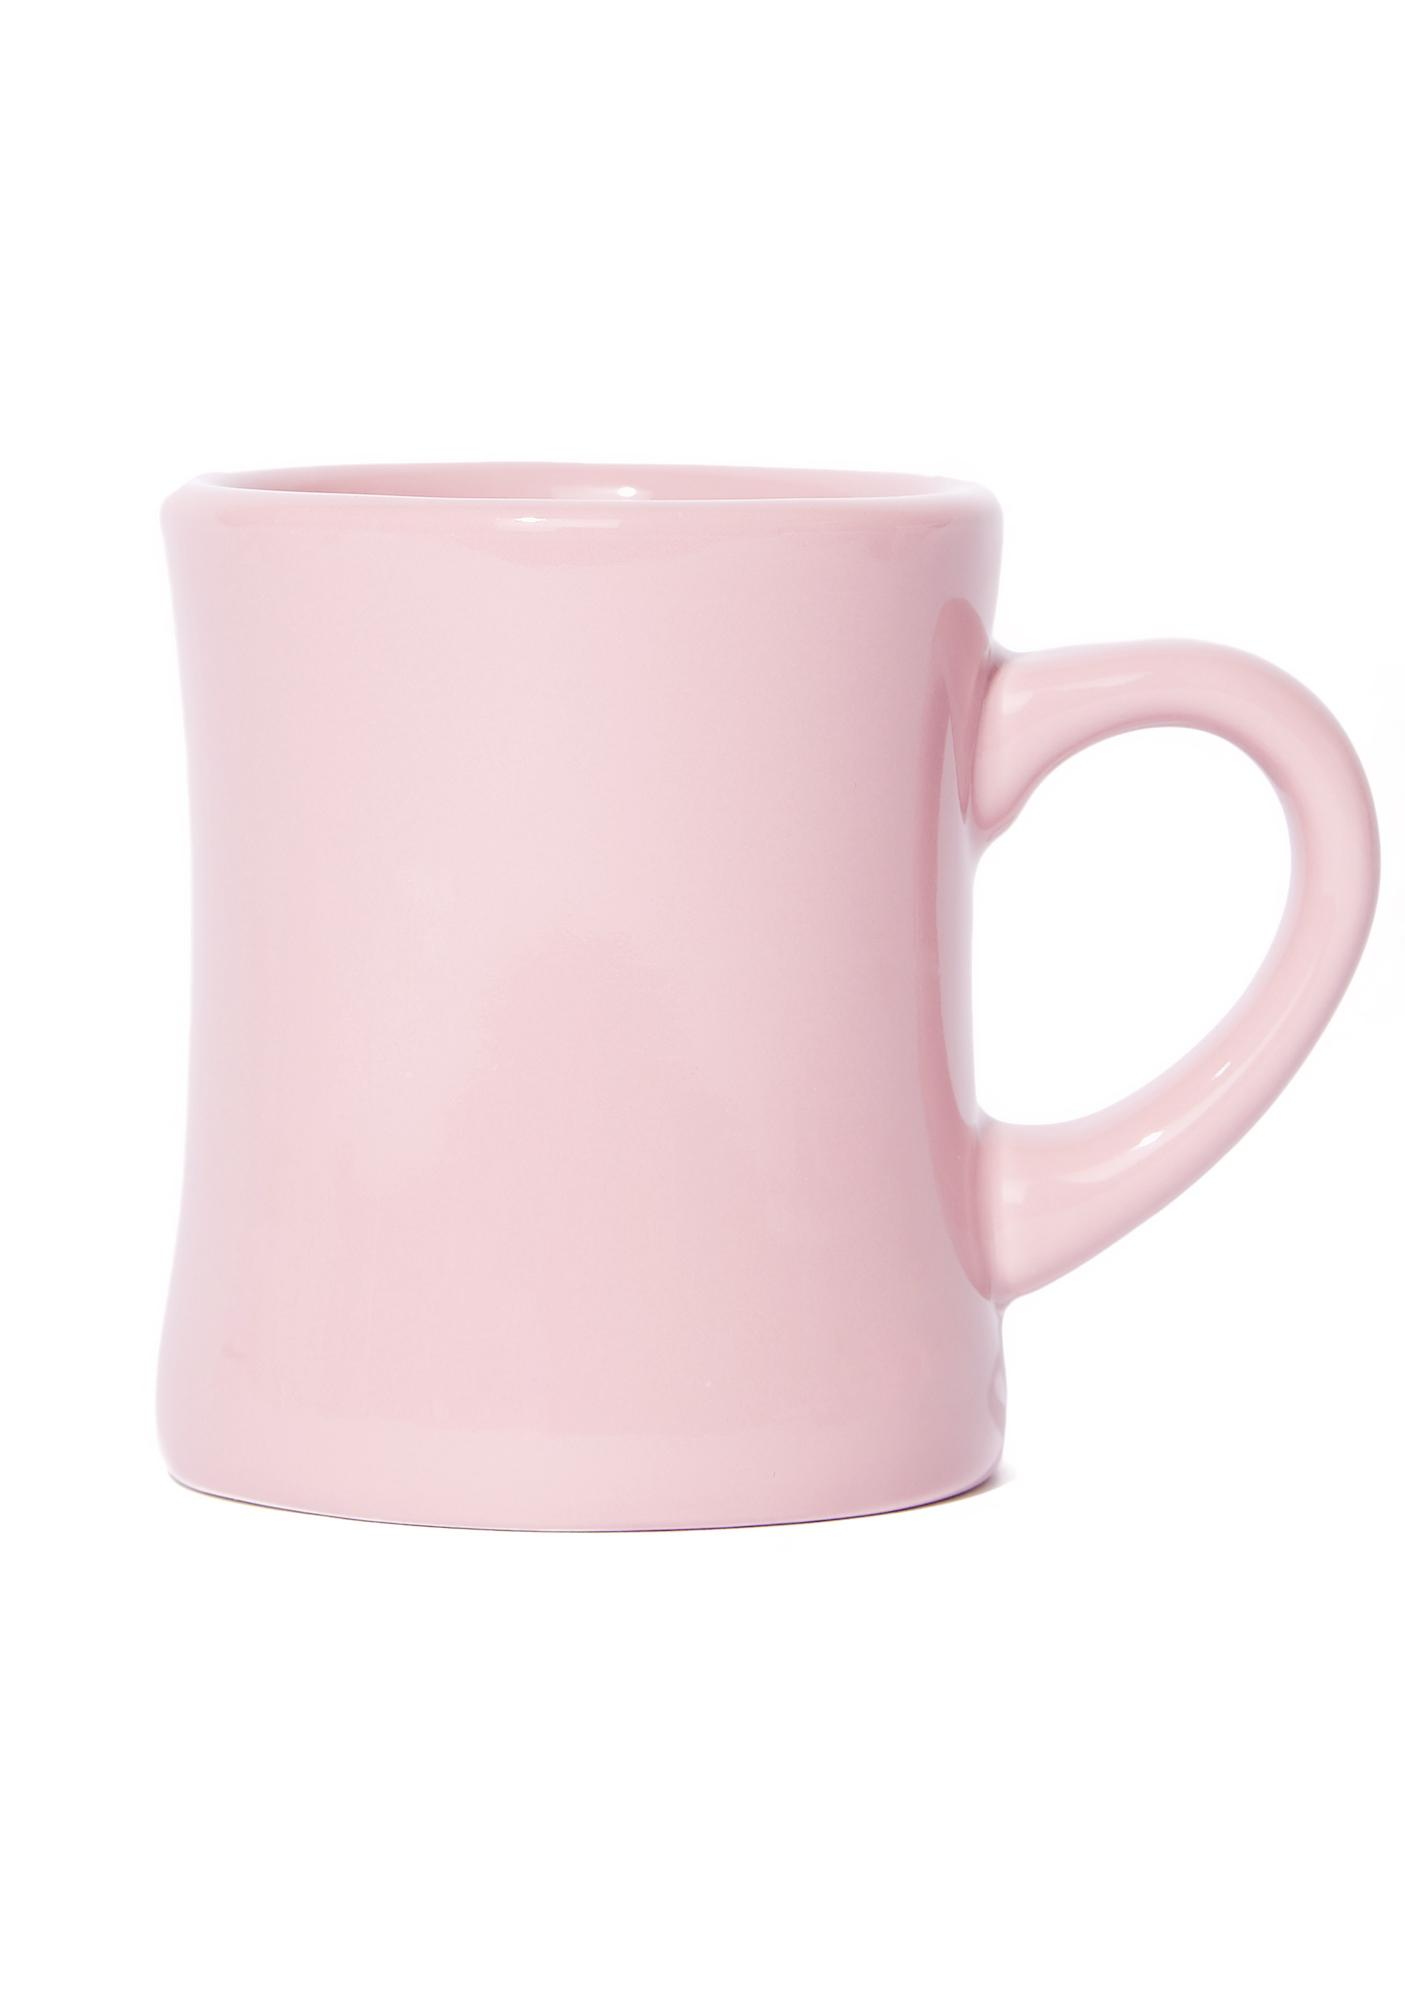 Jac Vanek Victimized Mug